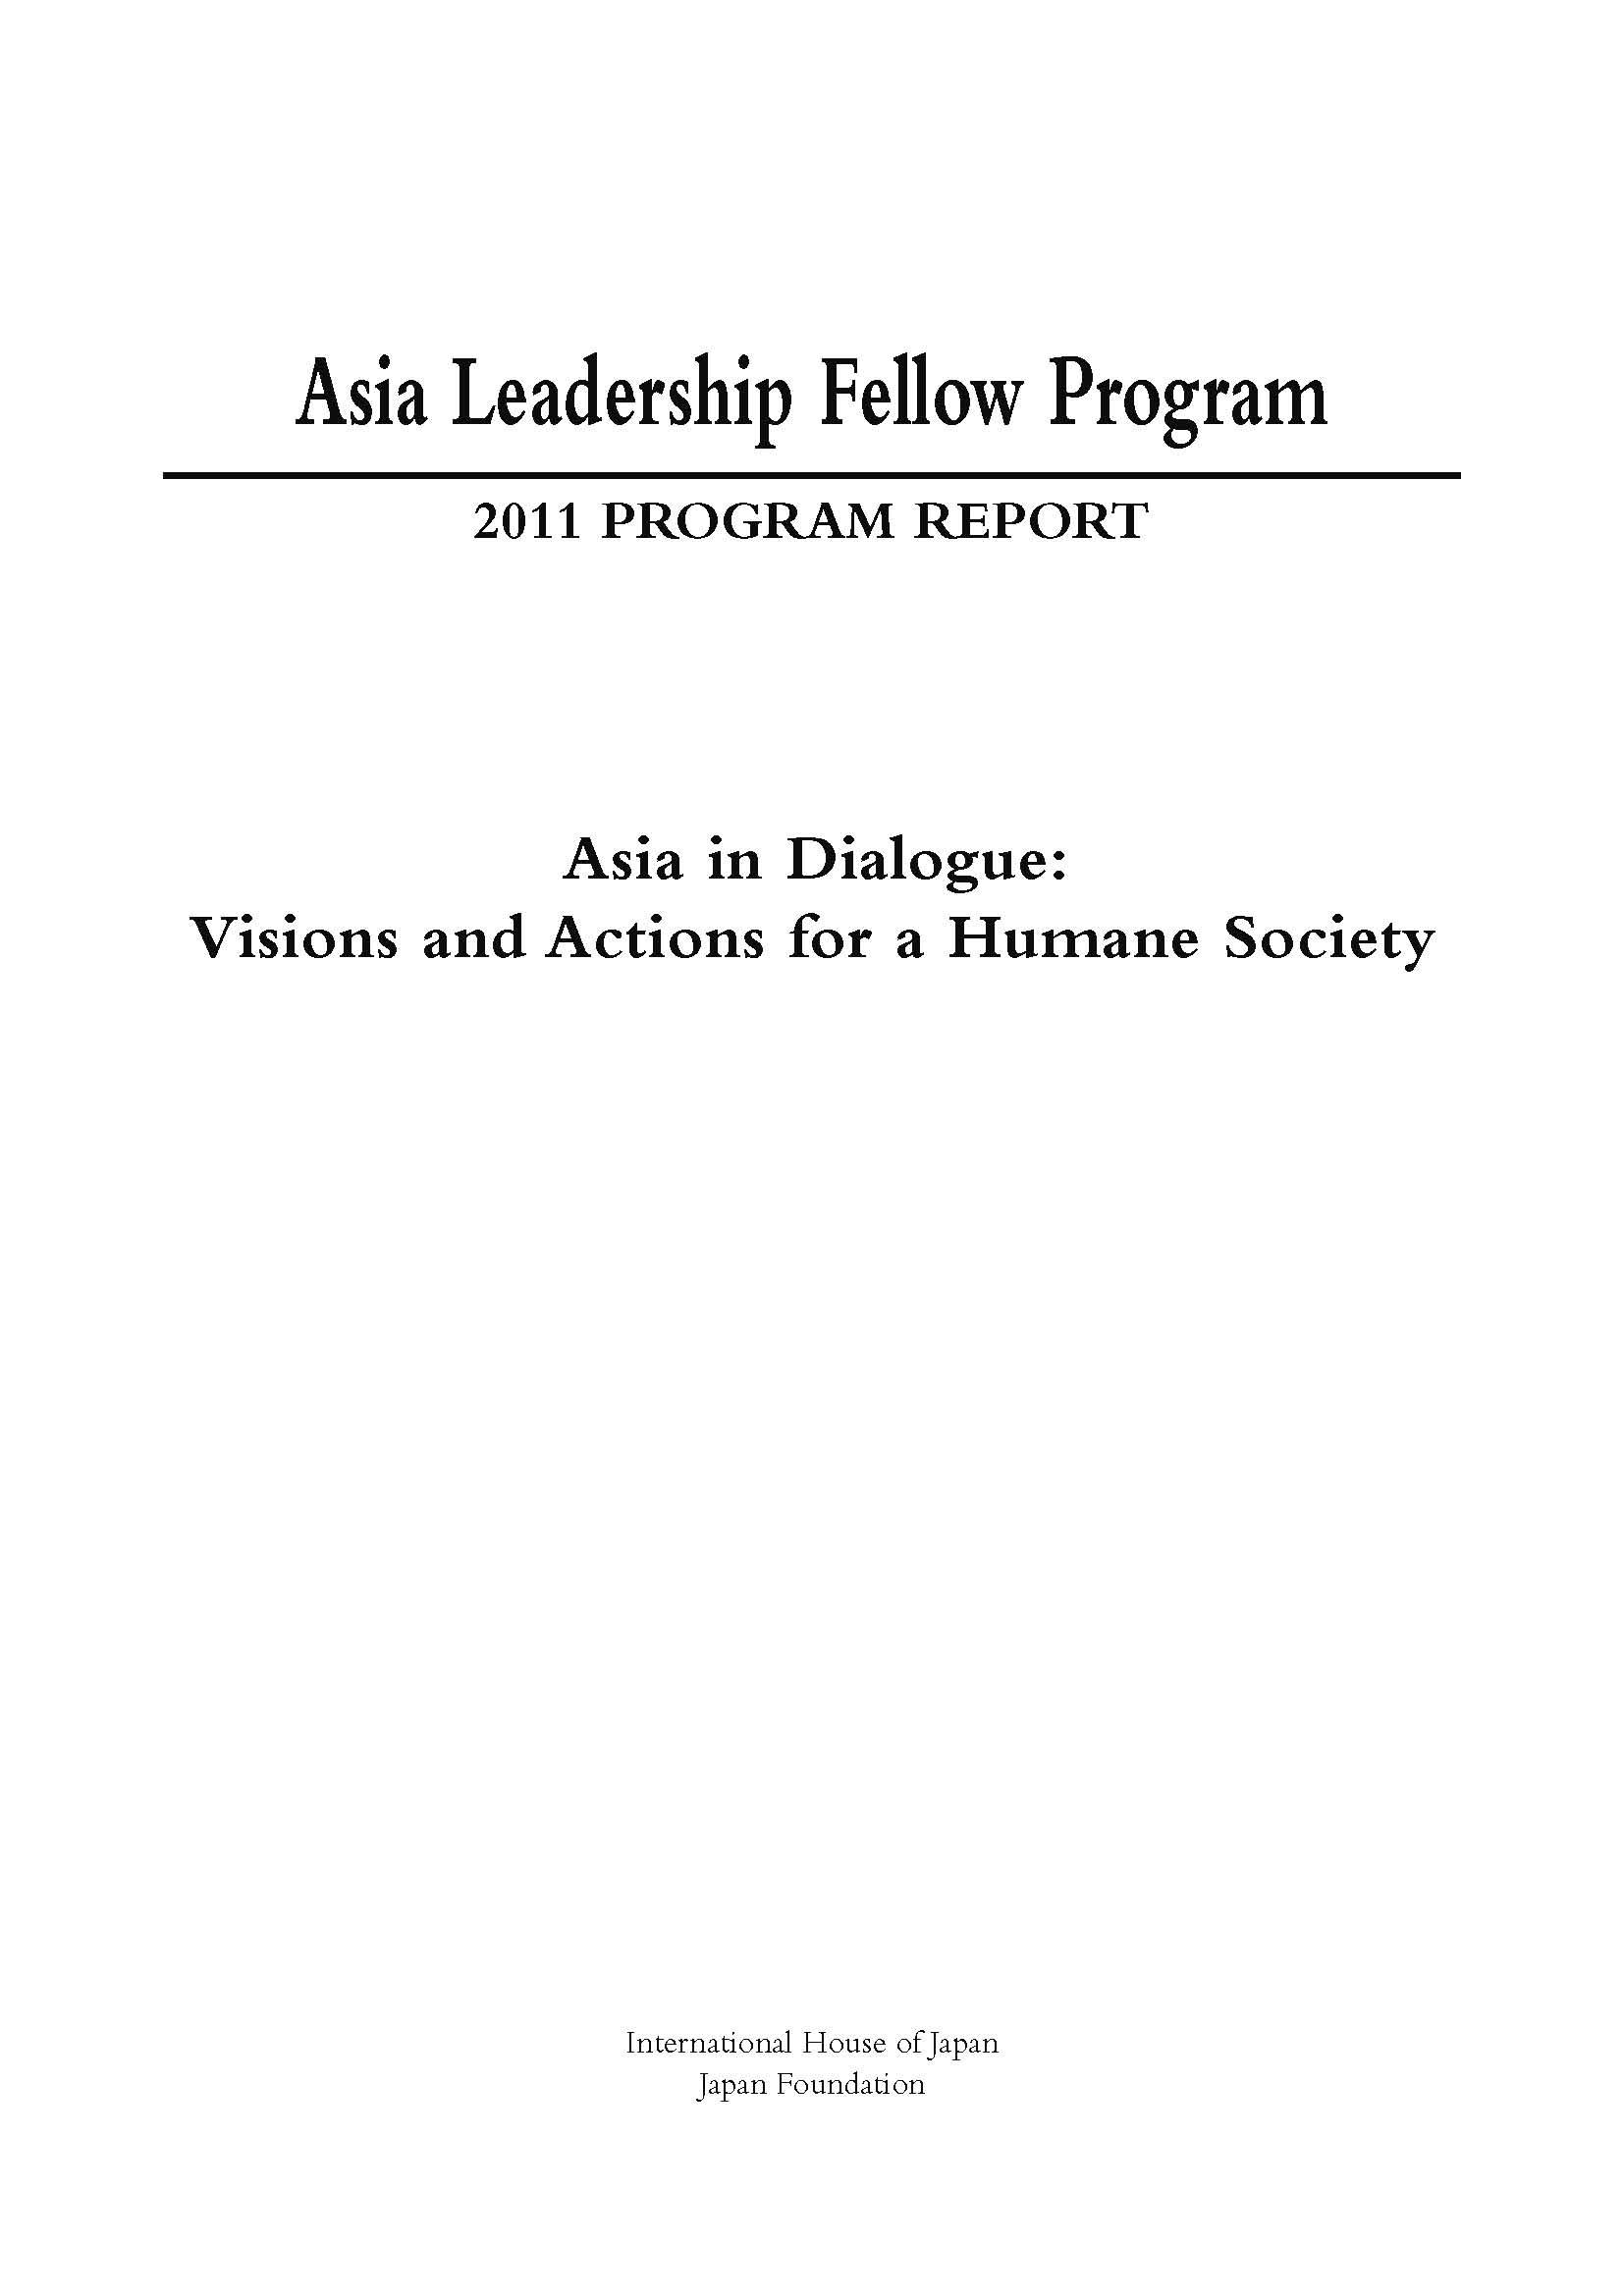 Asia Leadership Fellow Program